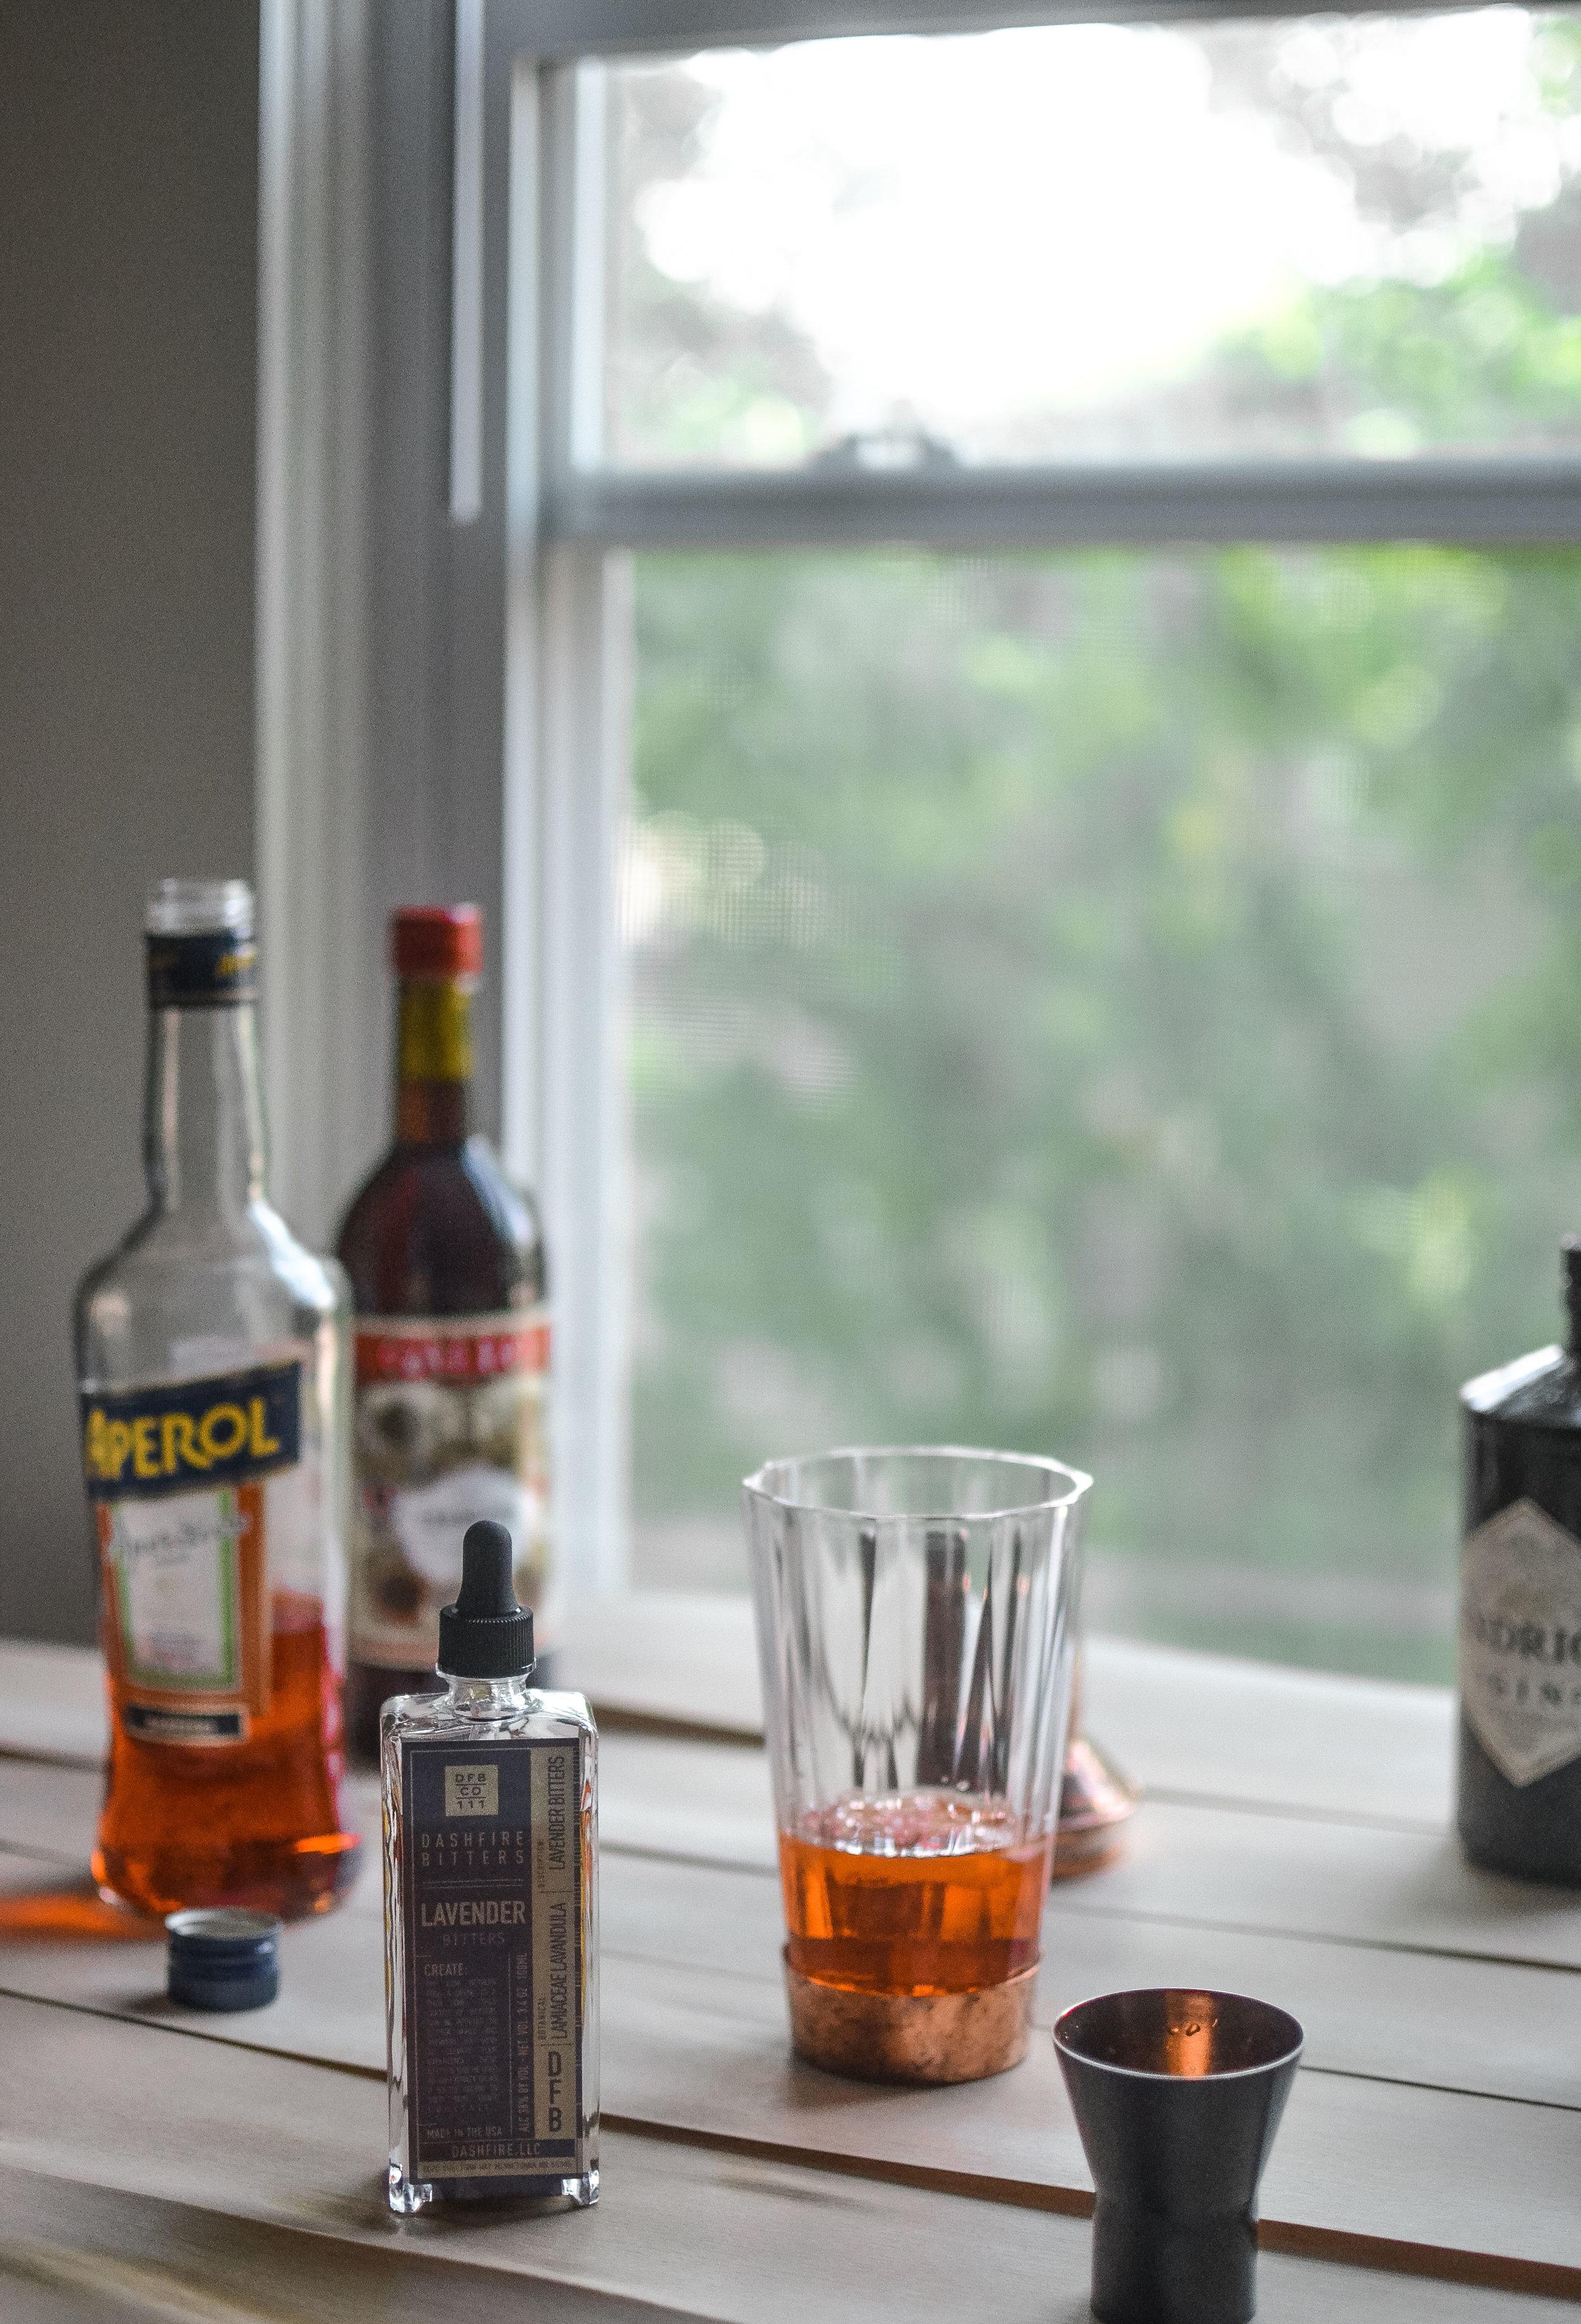 Wendling_Boyd_Starlight_Lavender_Negroni_Cocktail_Recipe-3.jpg